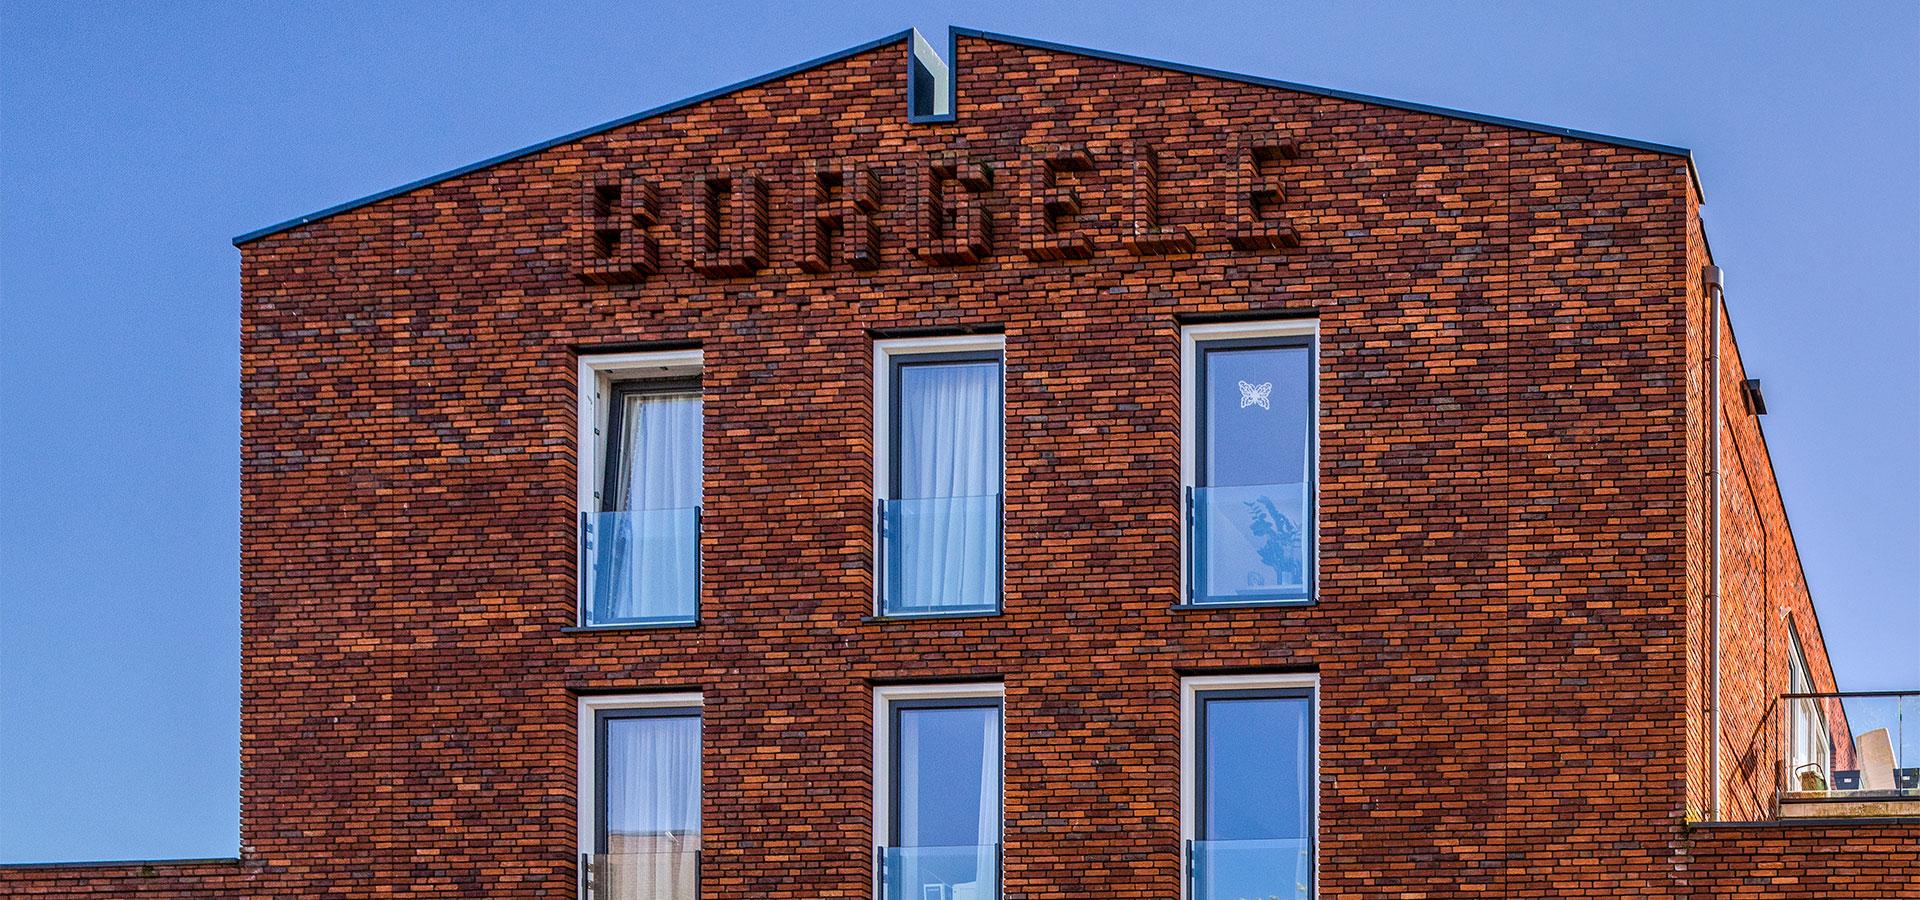 FARO architecten Borgele, Deventer 02